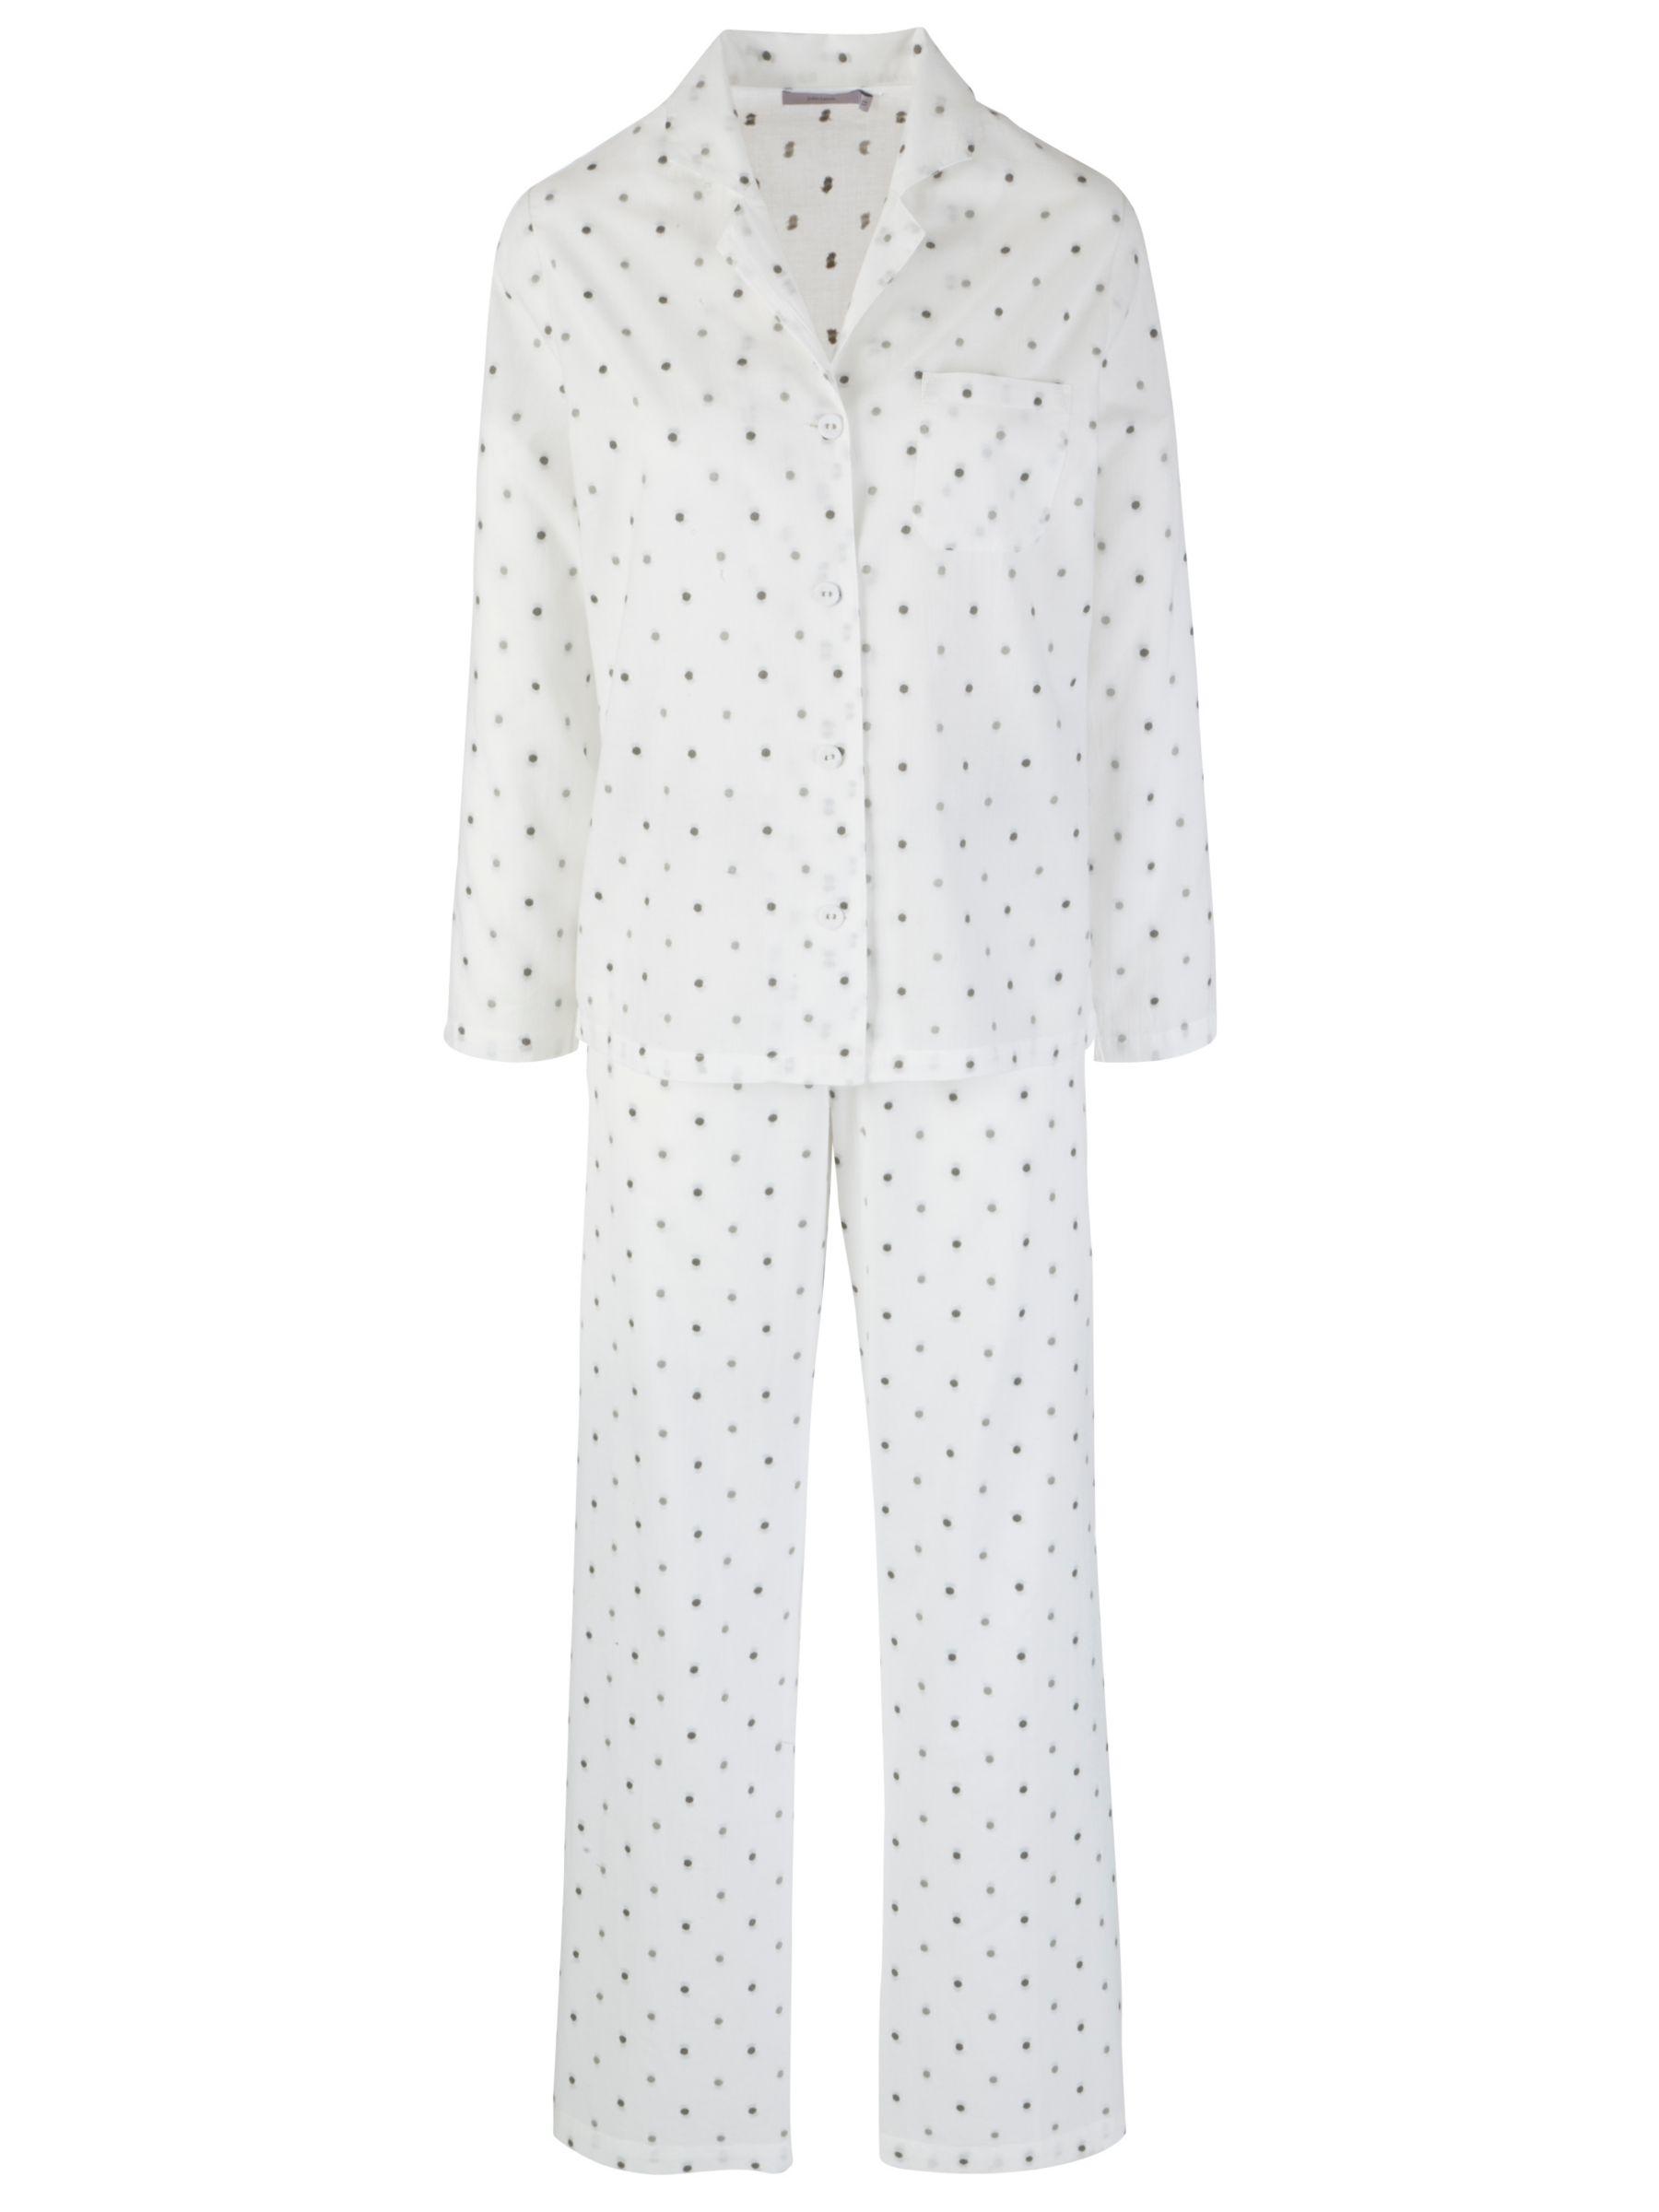 John Lewis Dobby Spot Pyjama Set, White/Grey